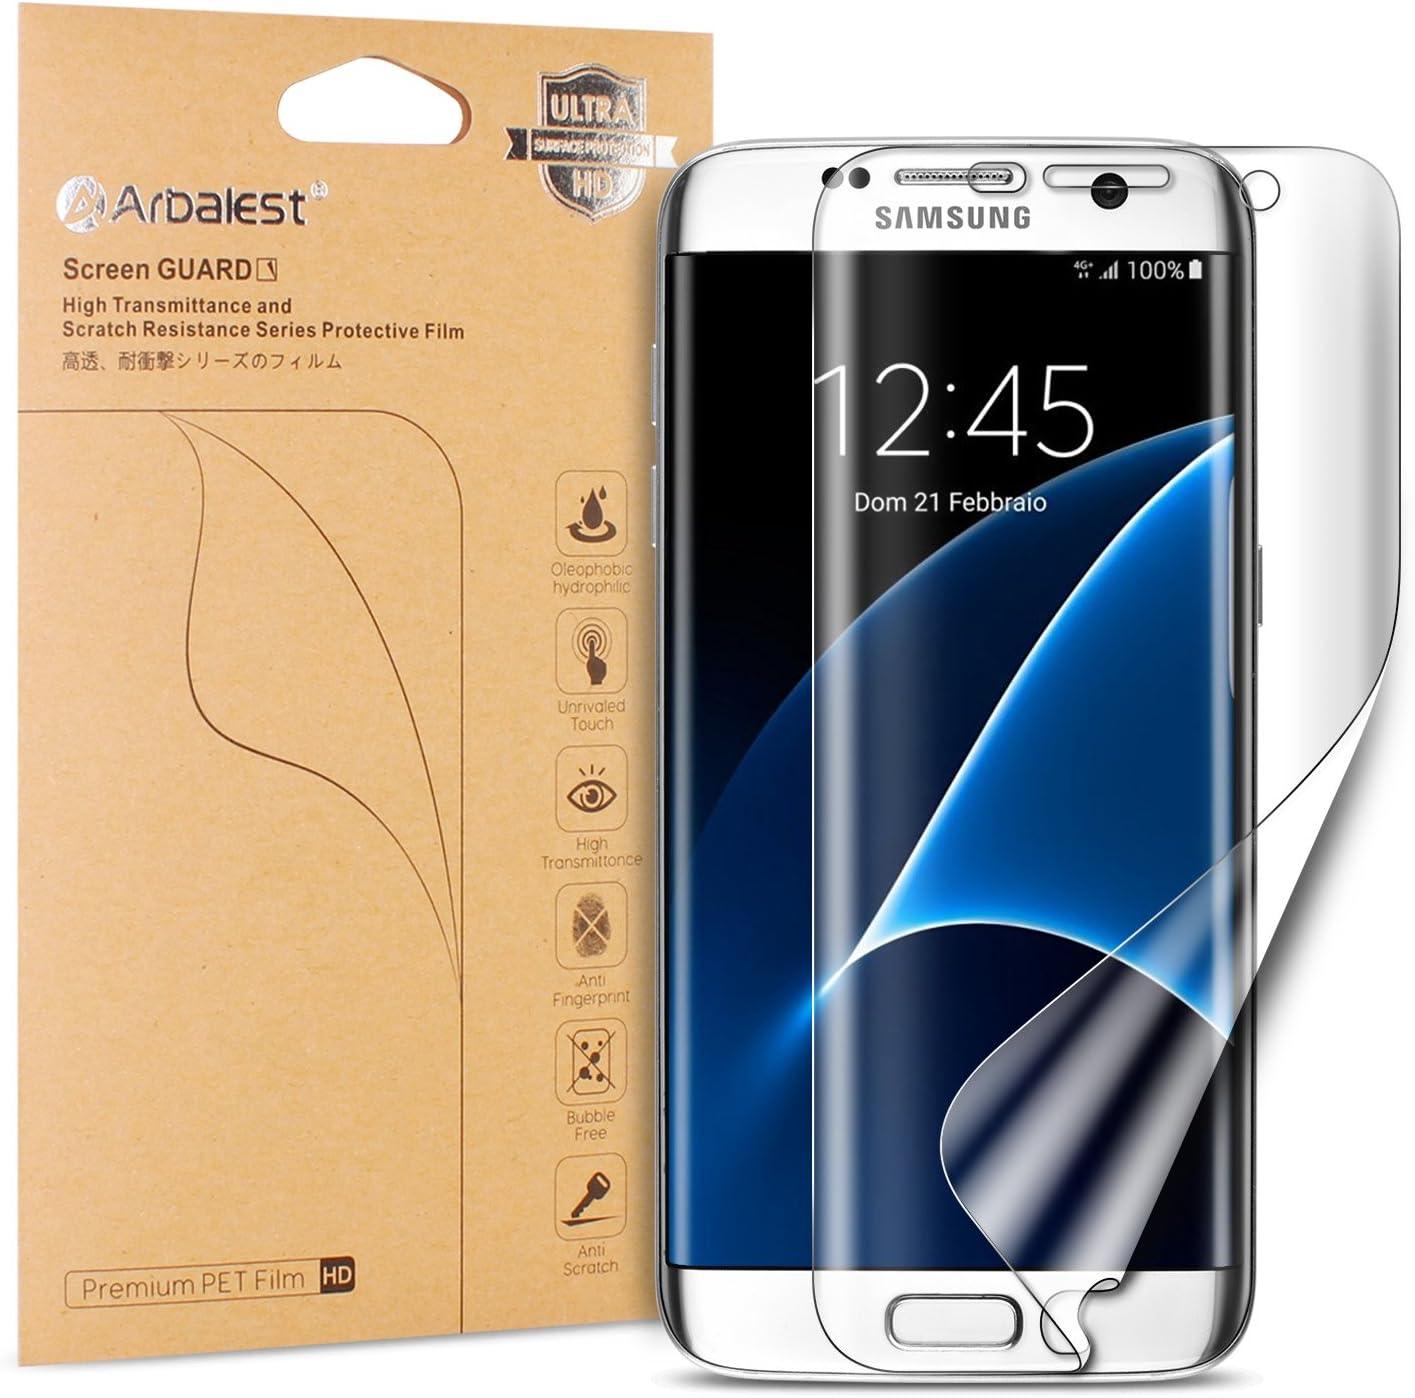 Arbalest Protector de Pantalla para Galaxy S7 Edge, [Cobertura Complete] Soft Tough TPU Ultra HD Protector de Pantalla para Samsung Galaxy S7 Edge: Amazon.es: Electrónica